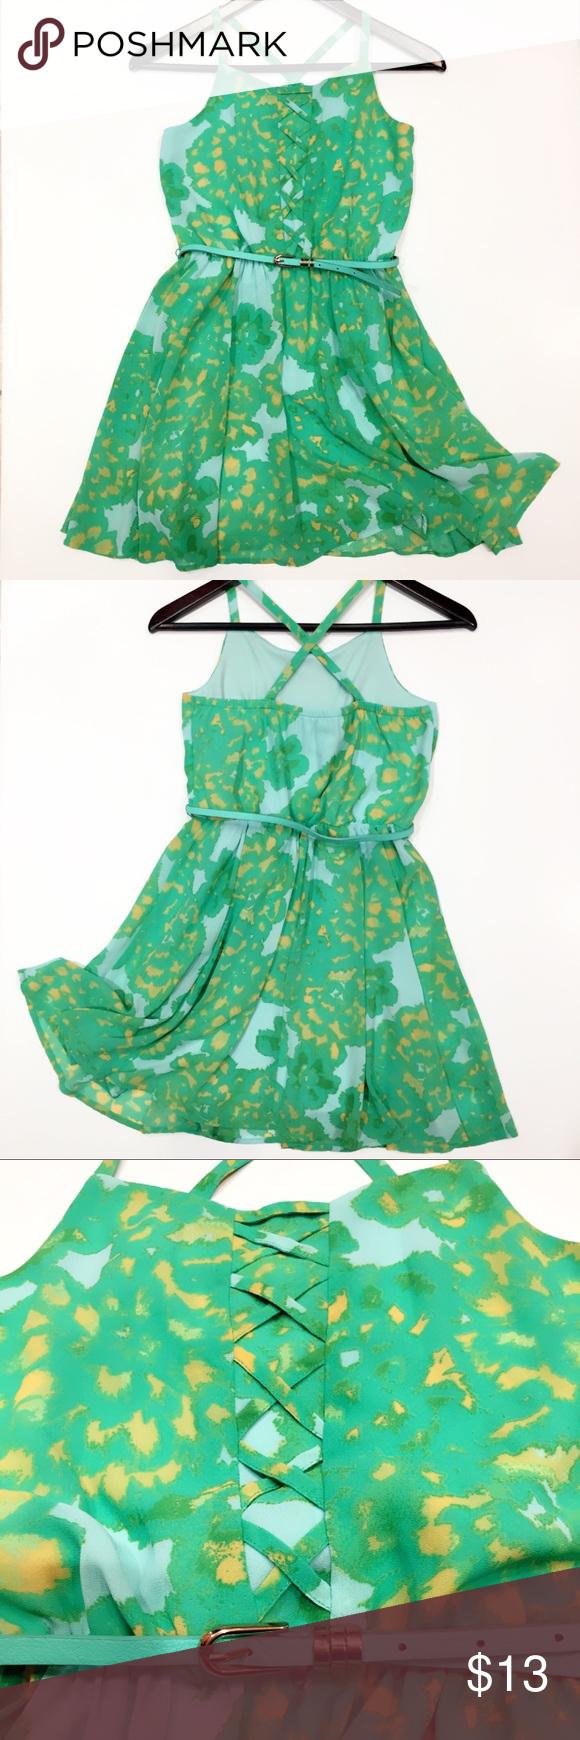 c0eeb1445ce GB girls casual dress Size L Junior EUC Gianni Bini GB girls Dresses Casual